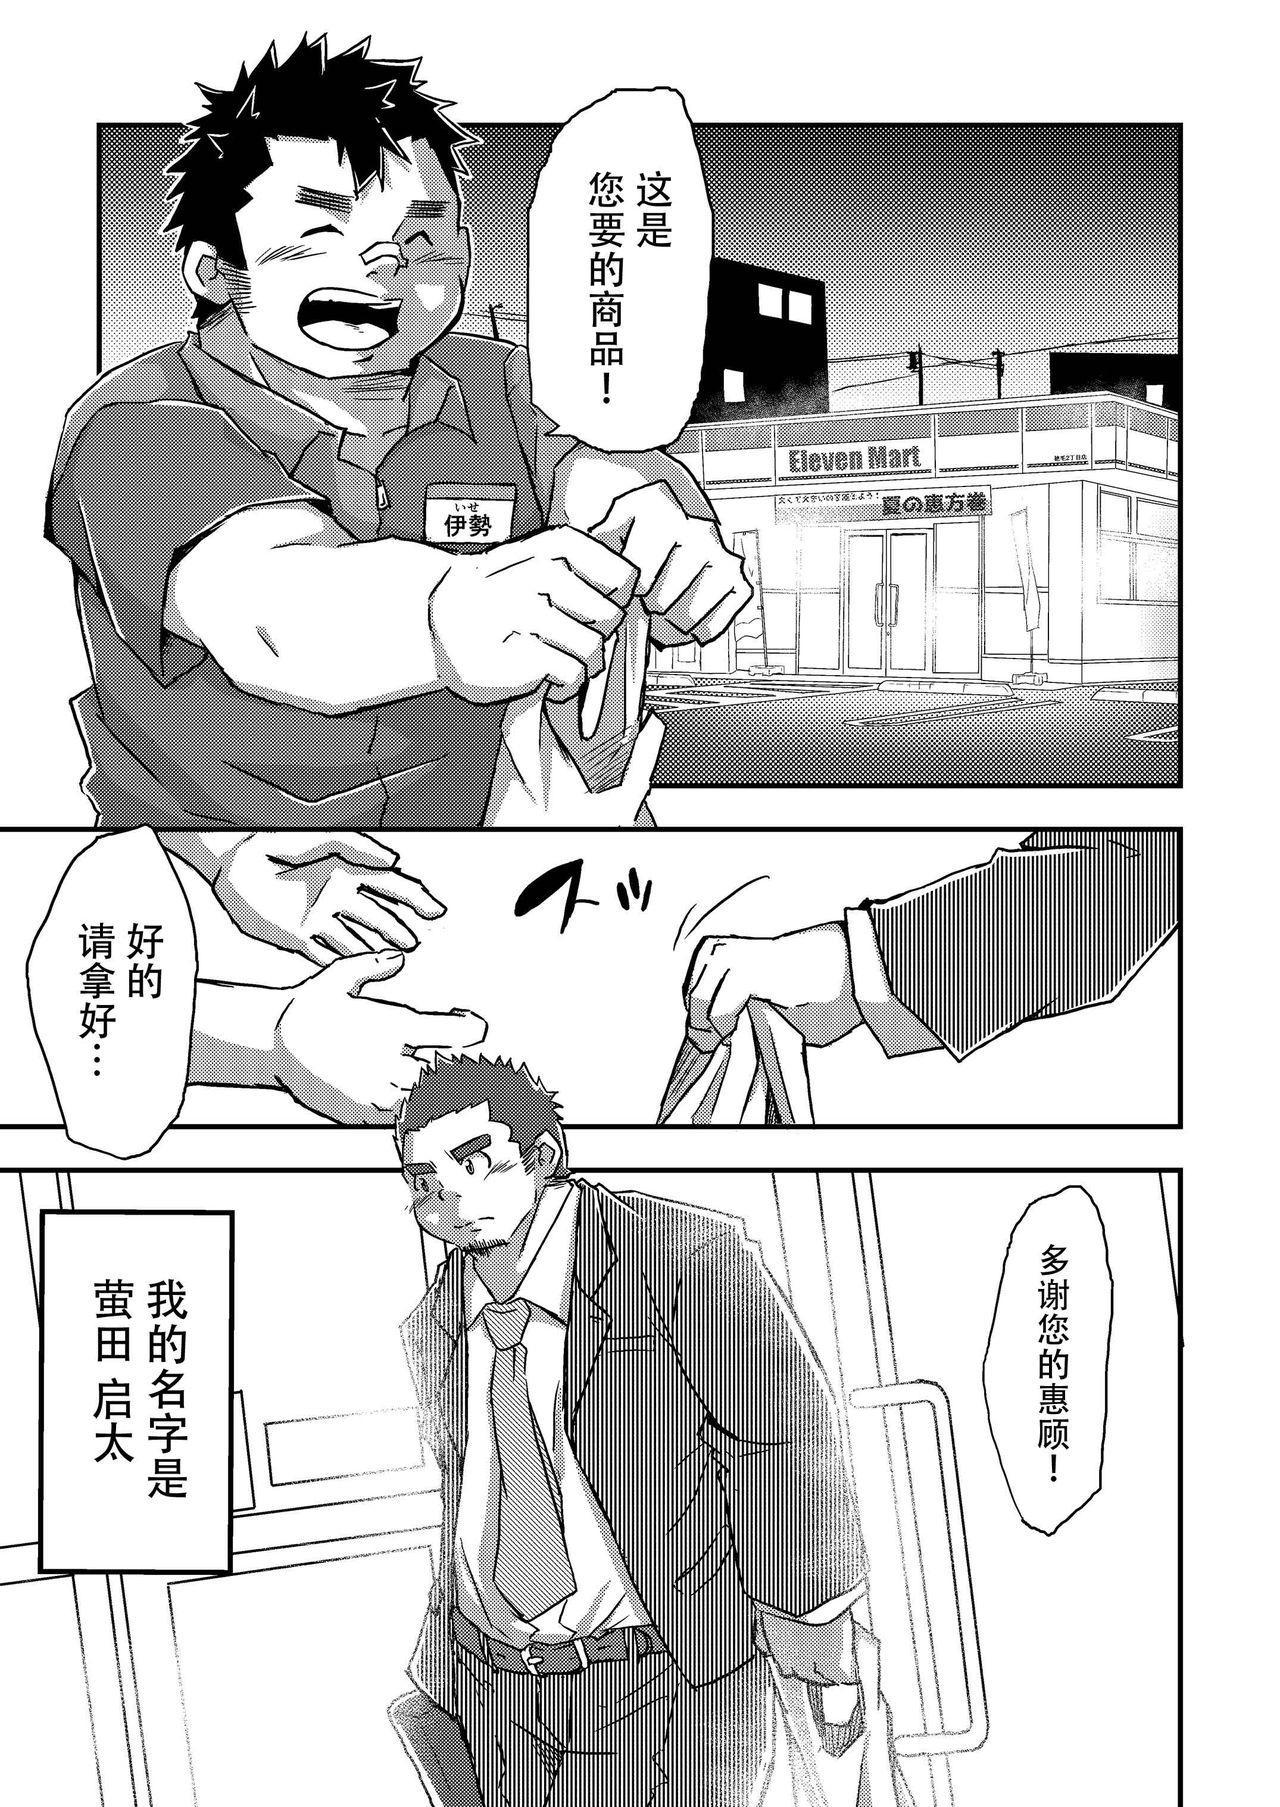 [CorkBOX (ngng)] Ise-kun wa Tamatte Iru. - Ise-kun is horny. [Chinese] {日曜日汉化} [Digital] 1